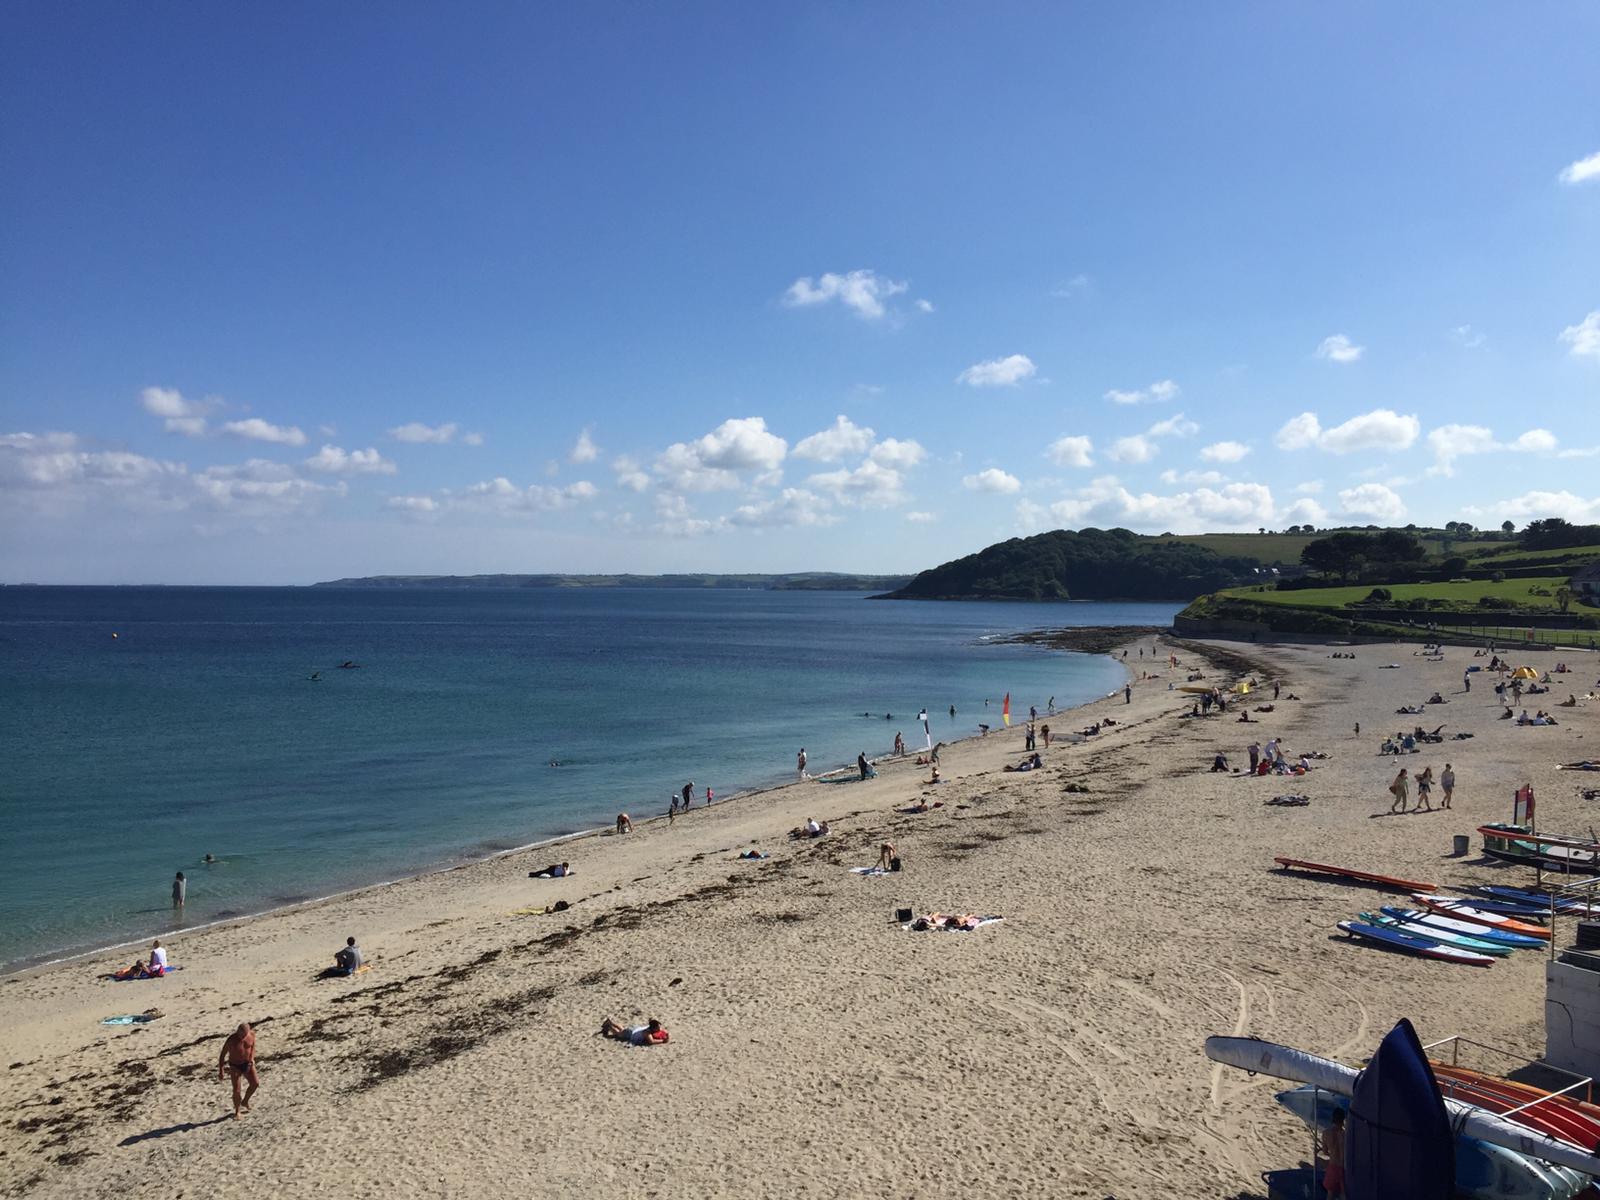 Gyllyngvase Beach (2 minutes walk from property)